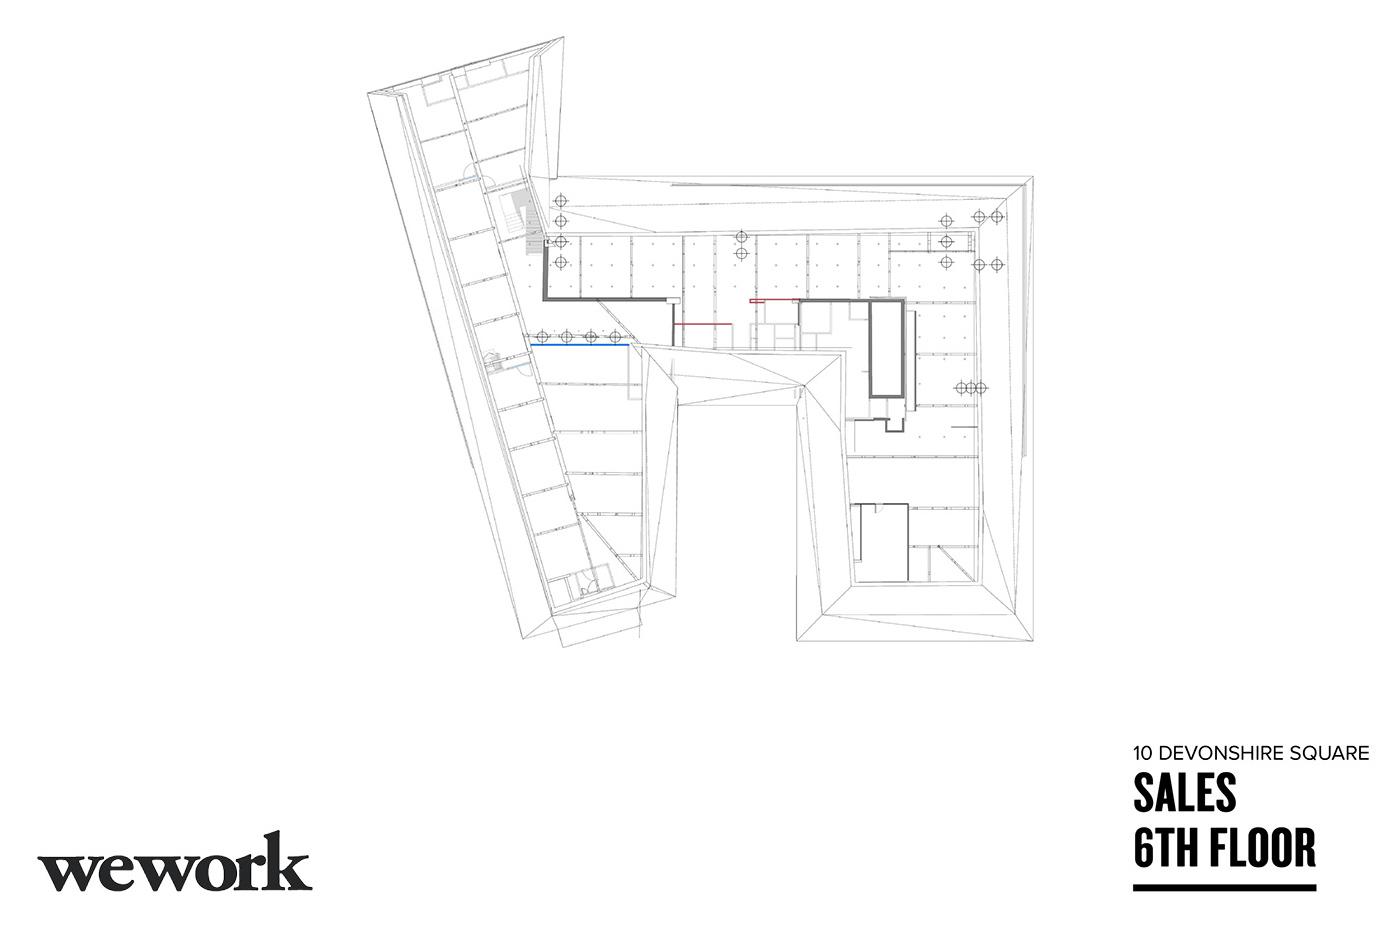 floorplans-18 copy.jpg